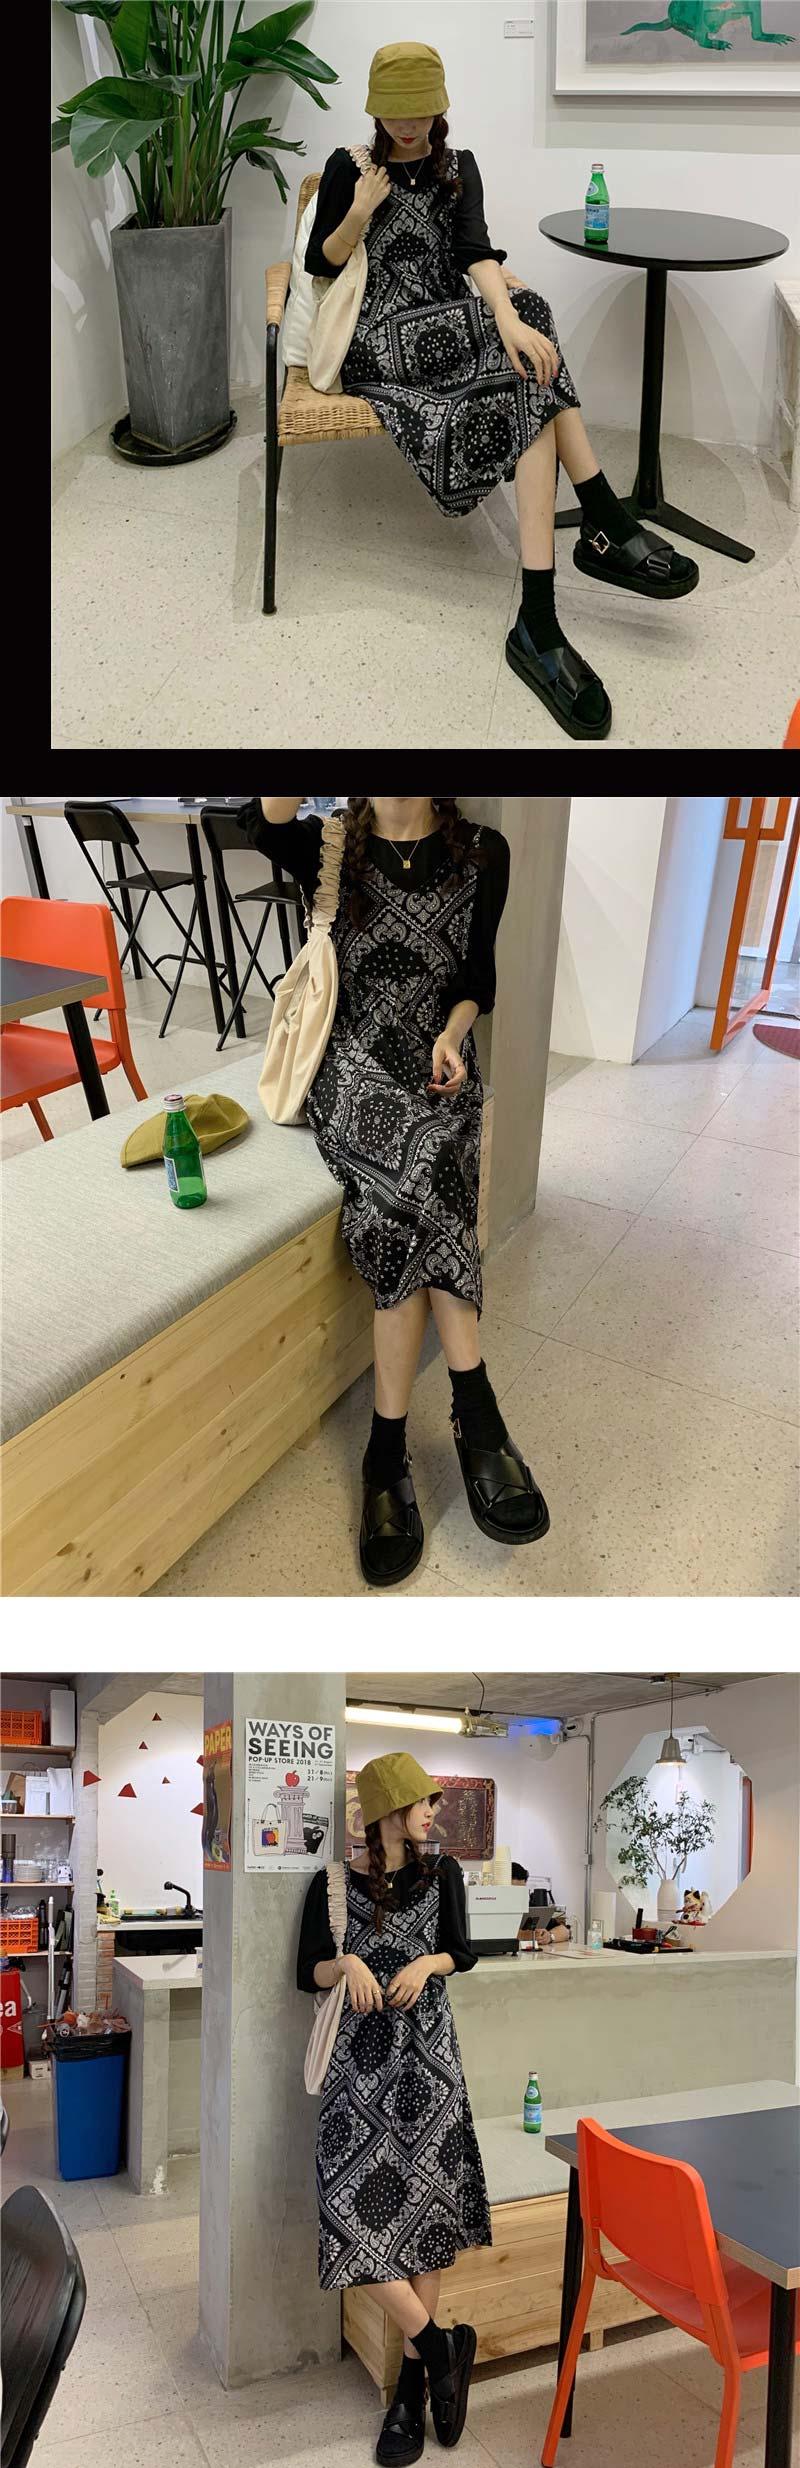 op1886 Paisley Strap Sleeveless Dress